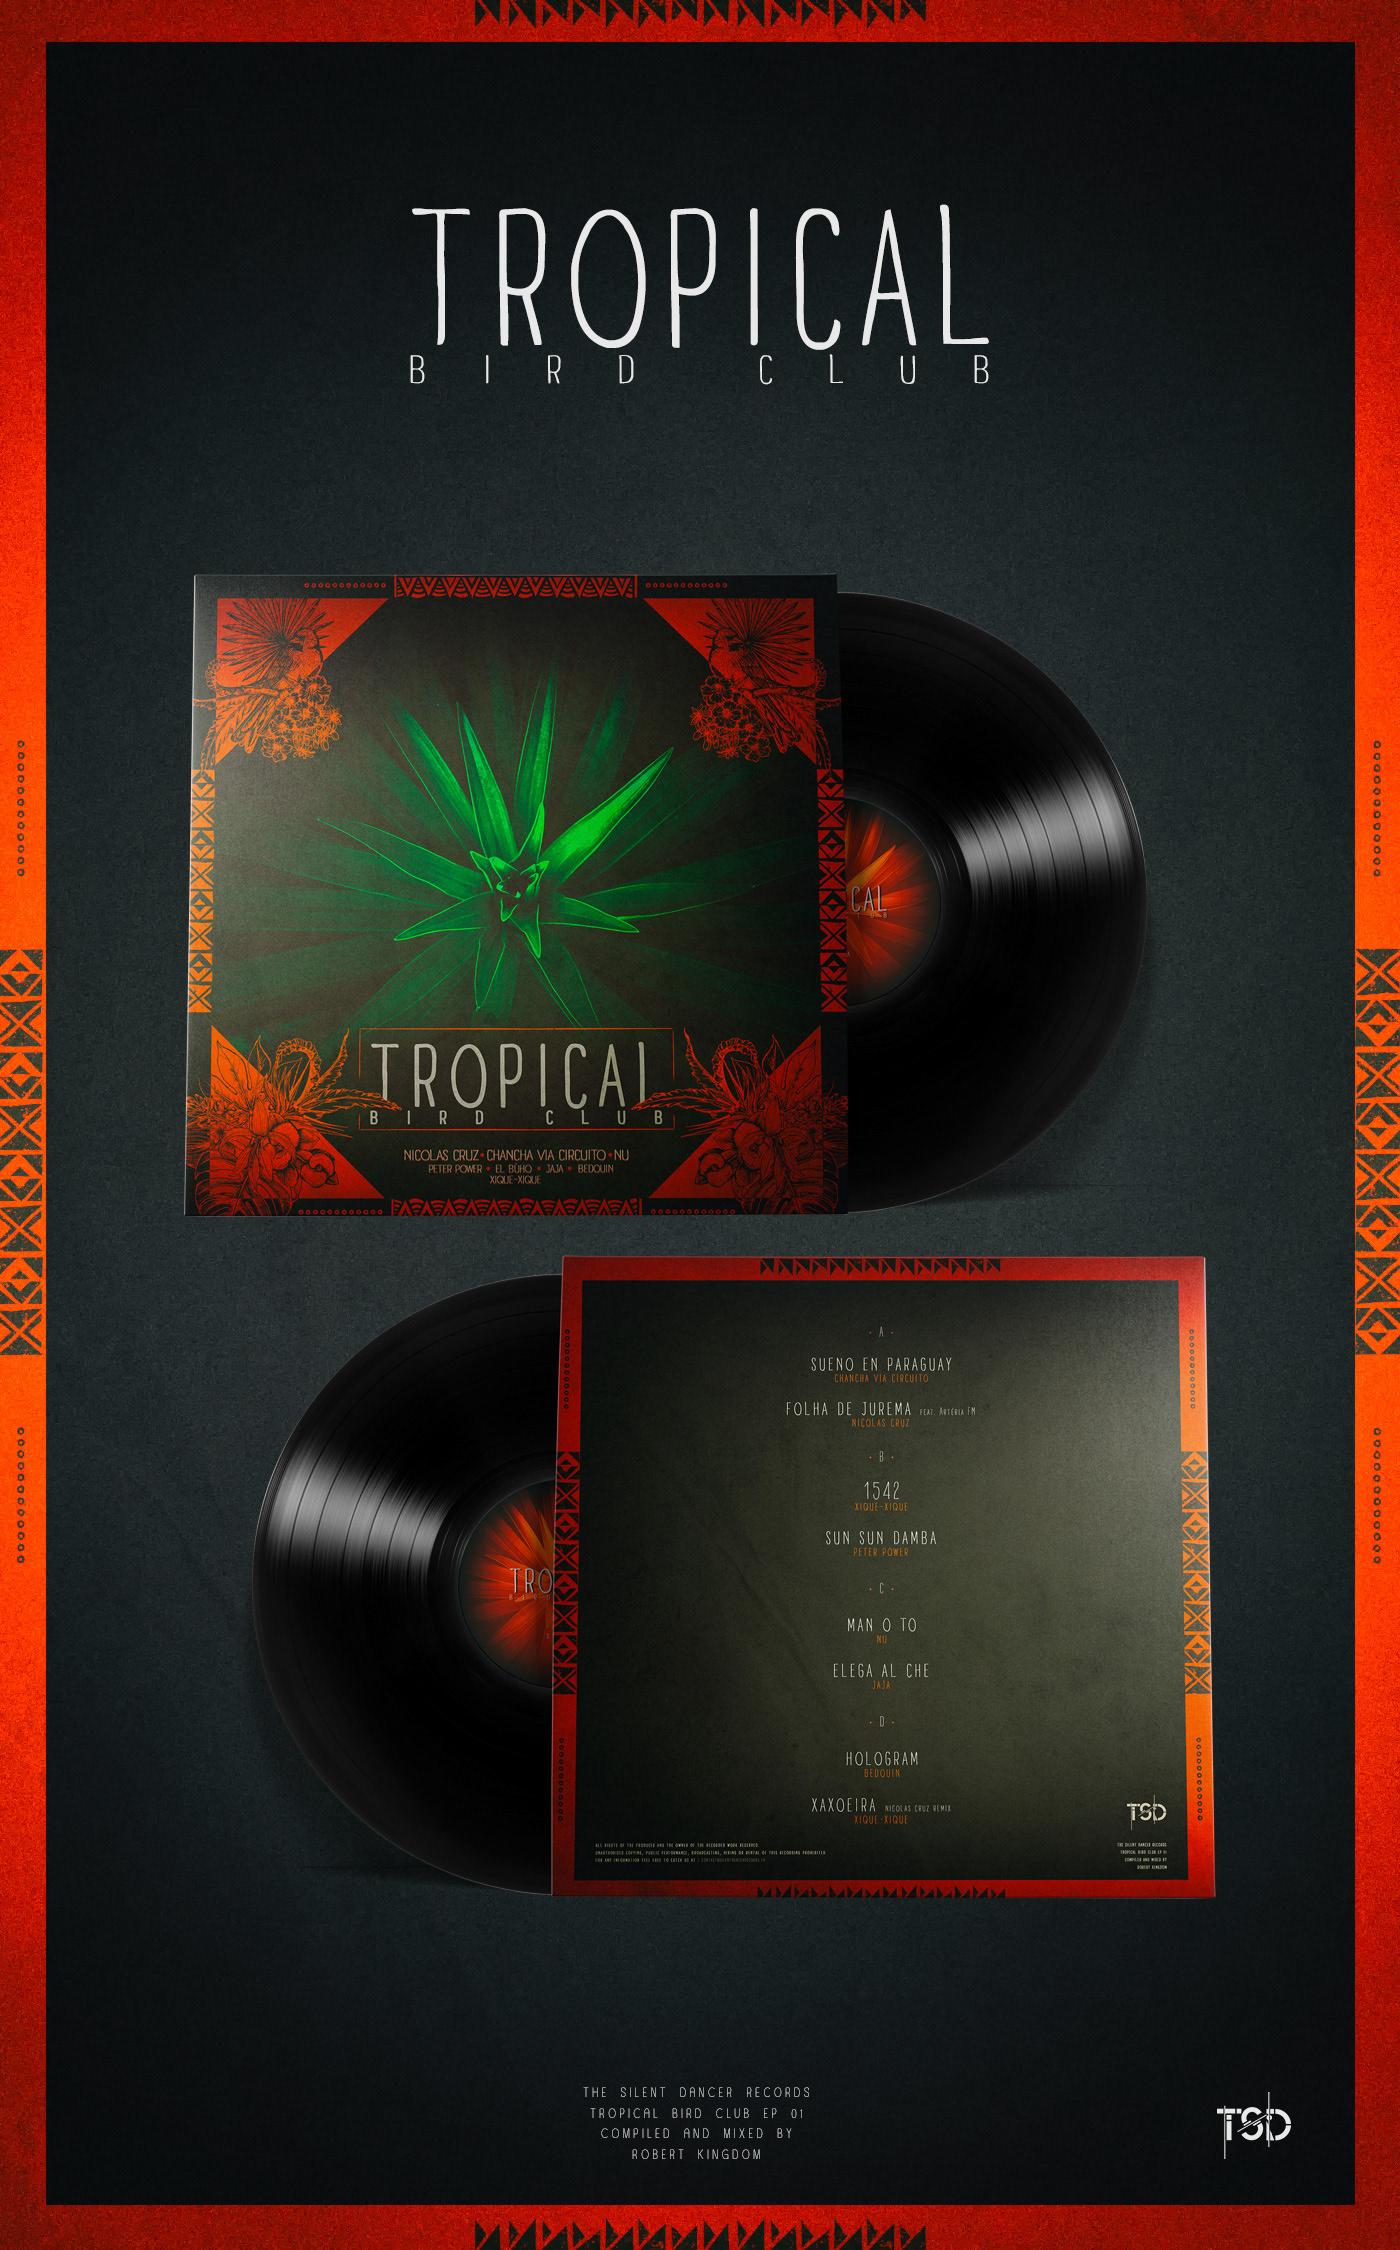 Vinyl Cover artwork design album cover music vinyl ep